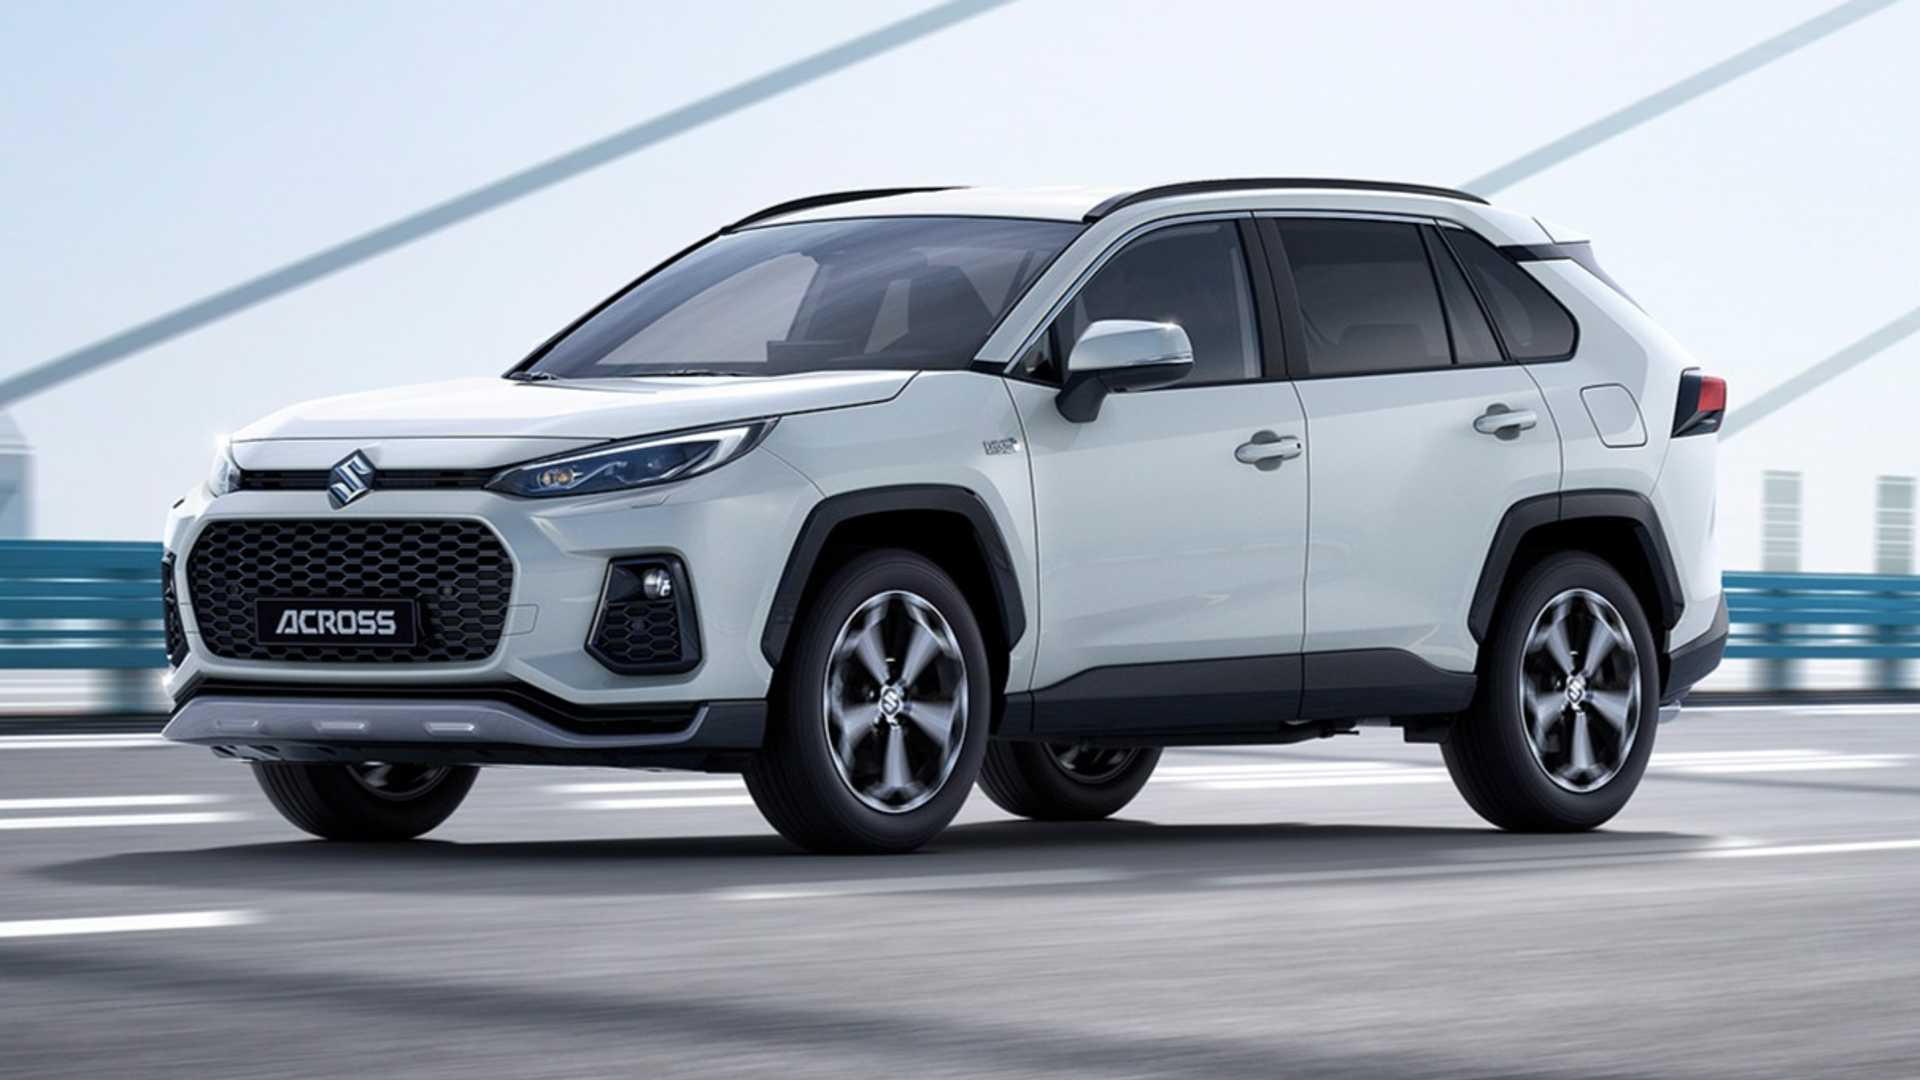 Kelebihan Kekurangan Toyota Suzuki Spesifikasi